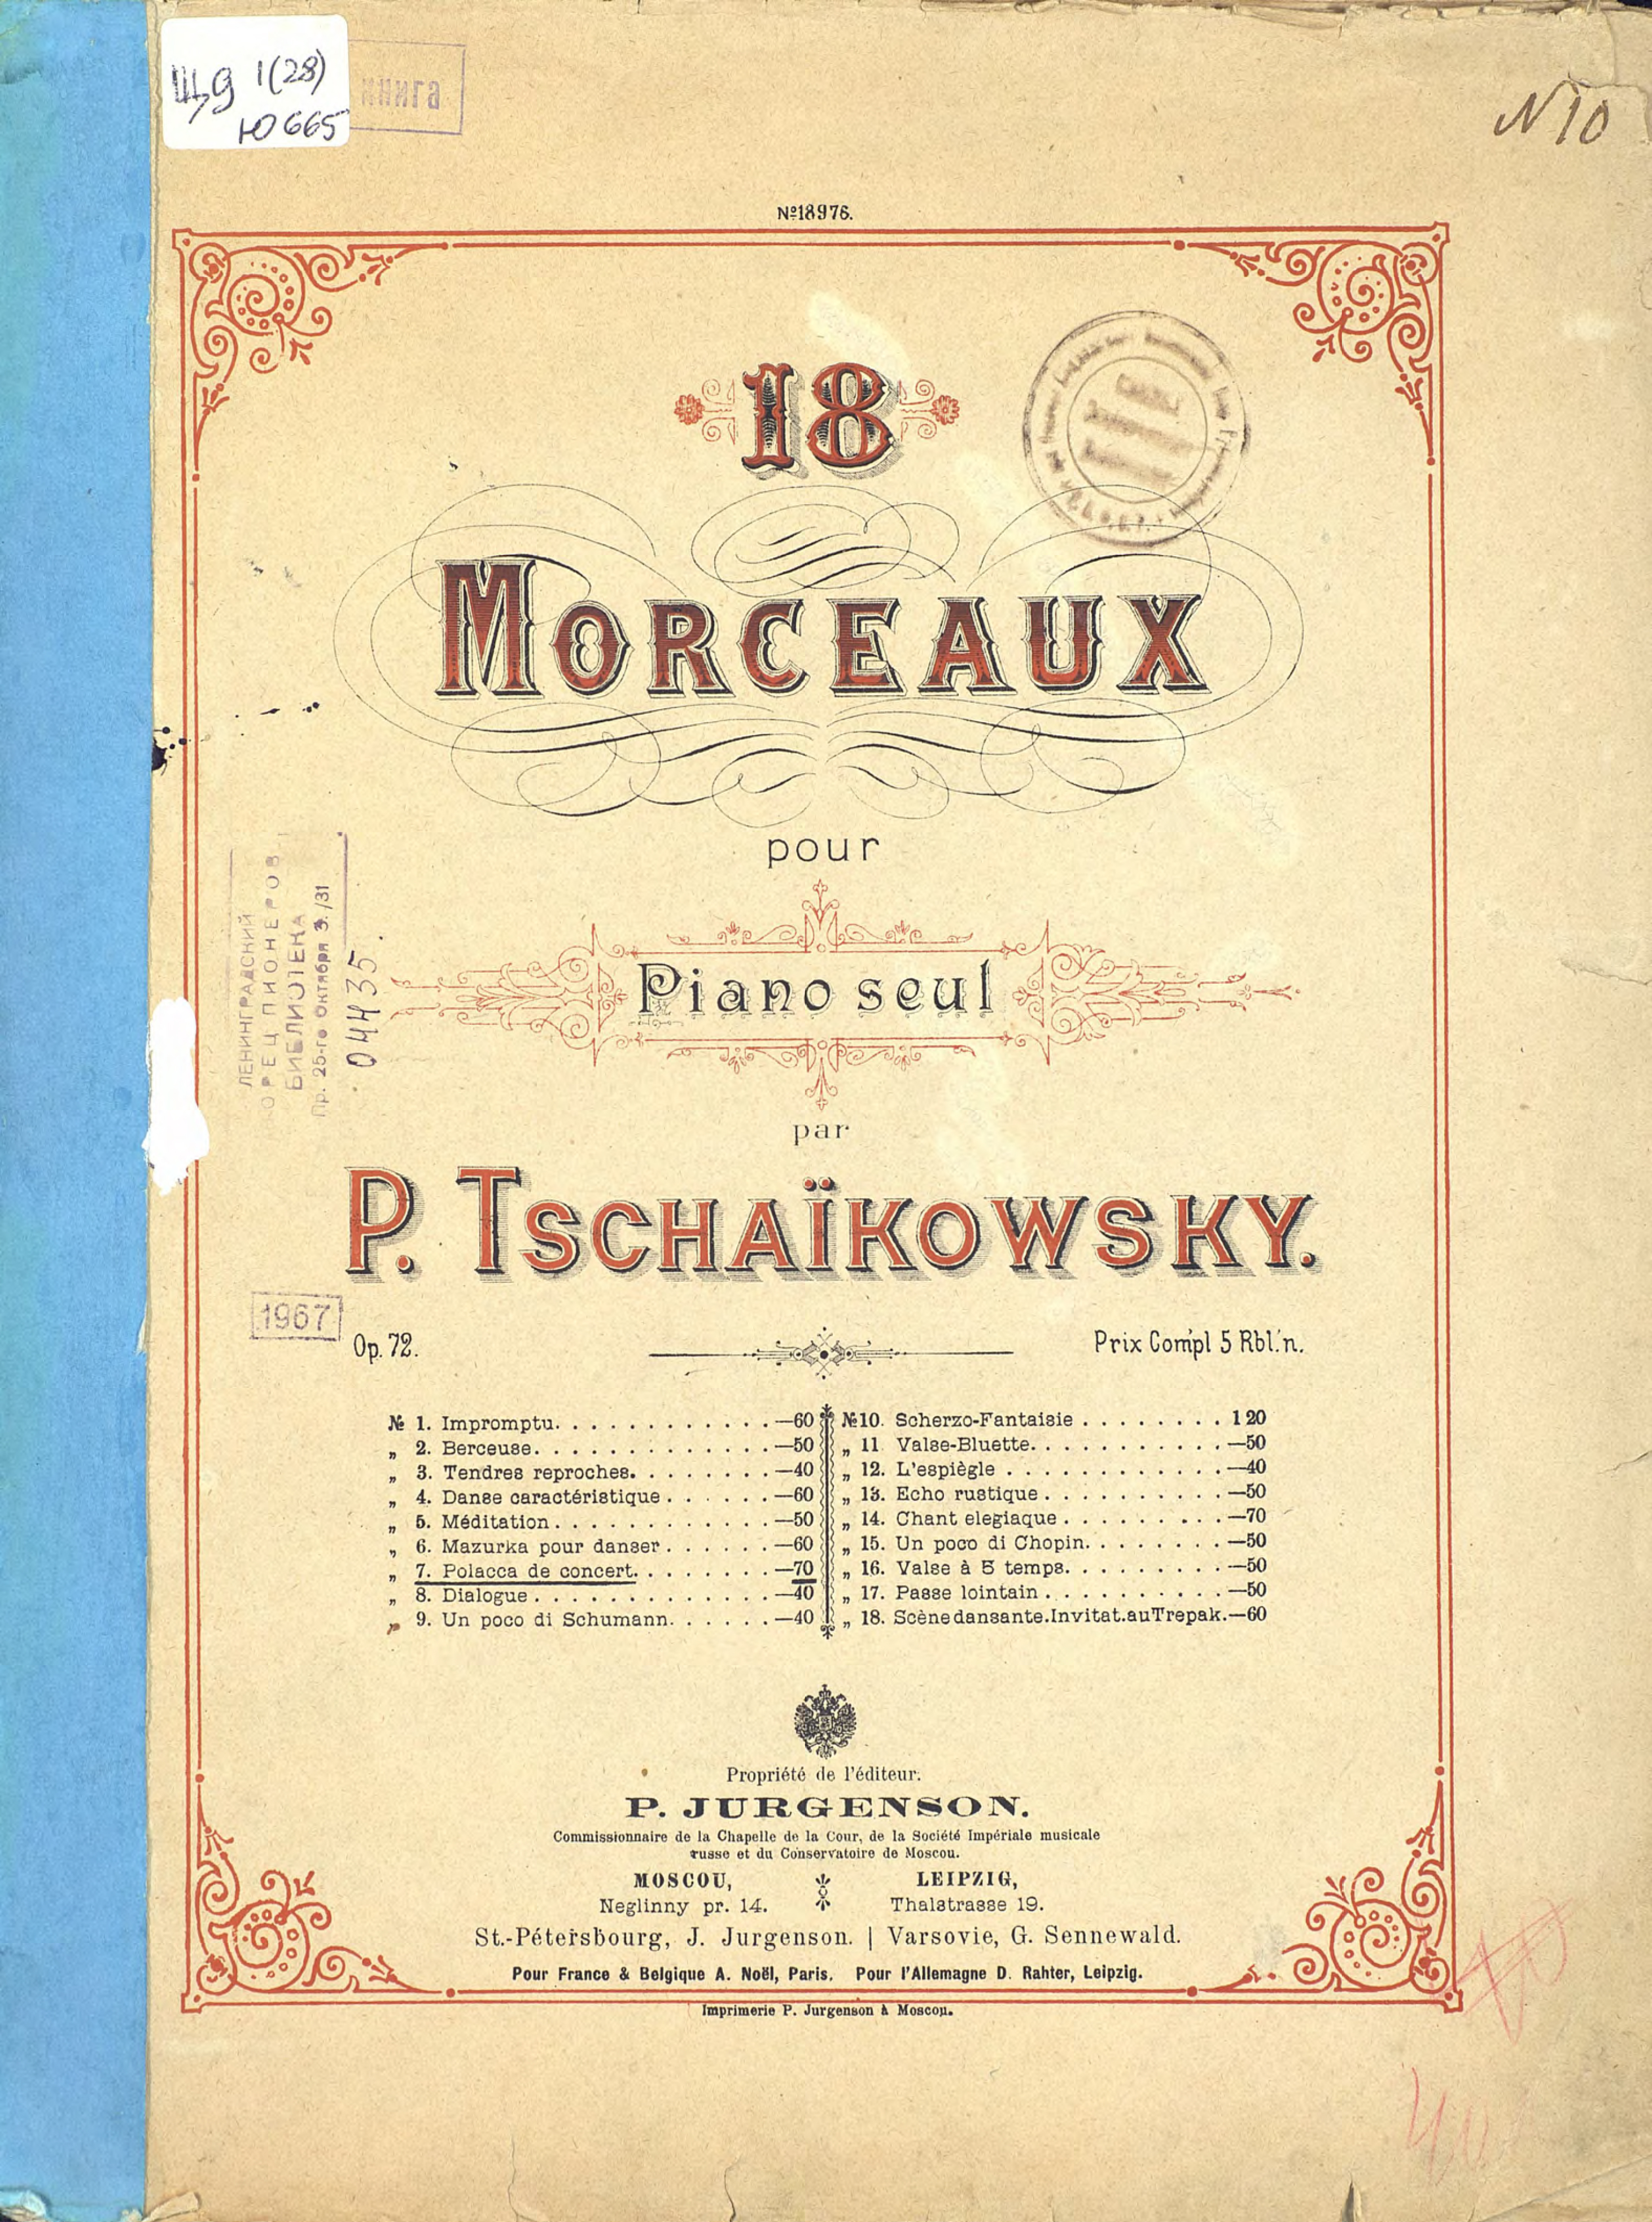 Петр Ильич Чайковский Polacca de concert, op. 72, № 7, pour Piano seul h nitschmann rondo alla polacca op 14